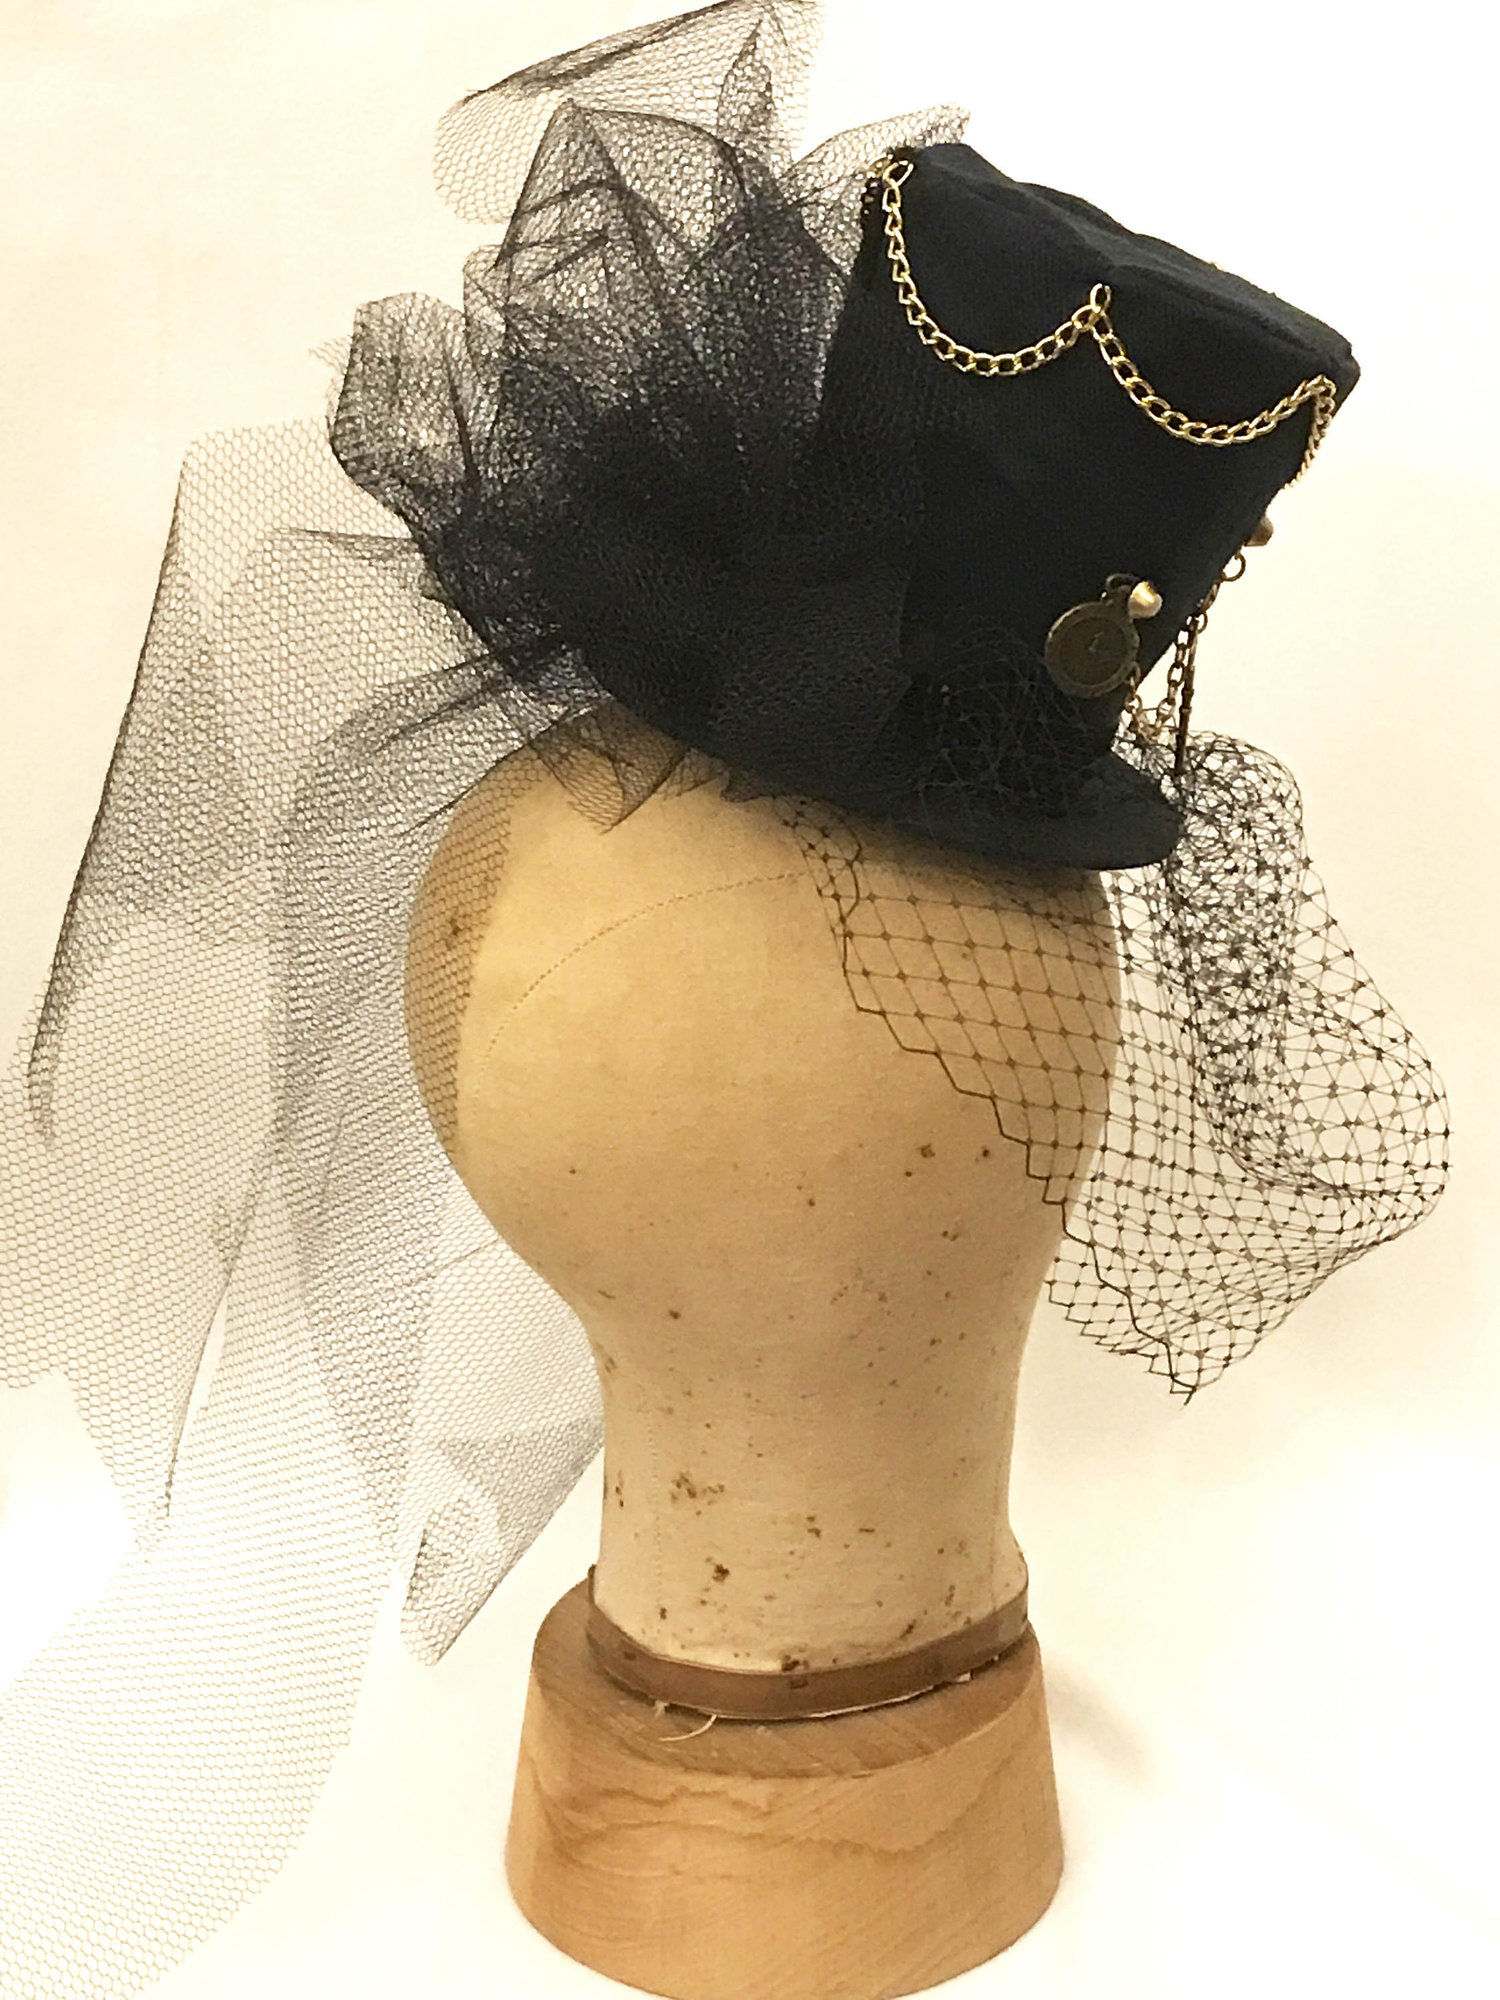 877245e8c3f4f Hats- Charming Lady Designs Handmade Millinery